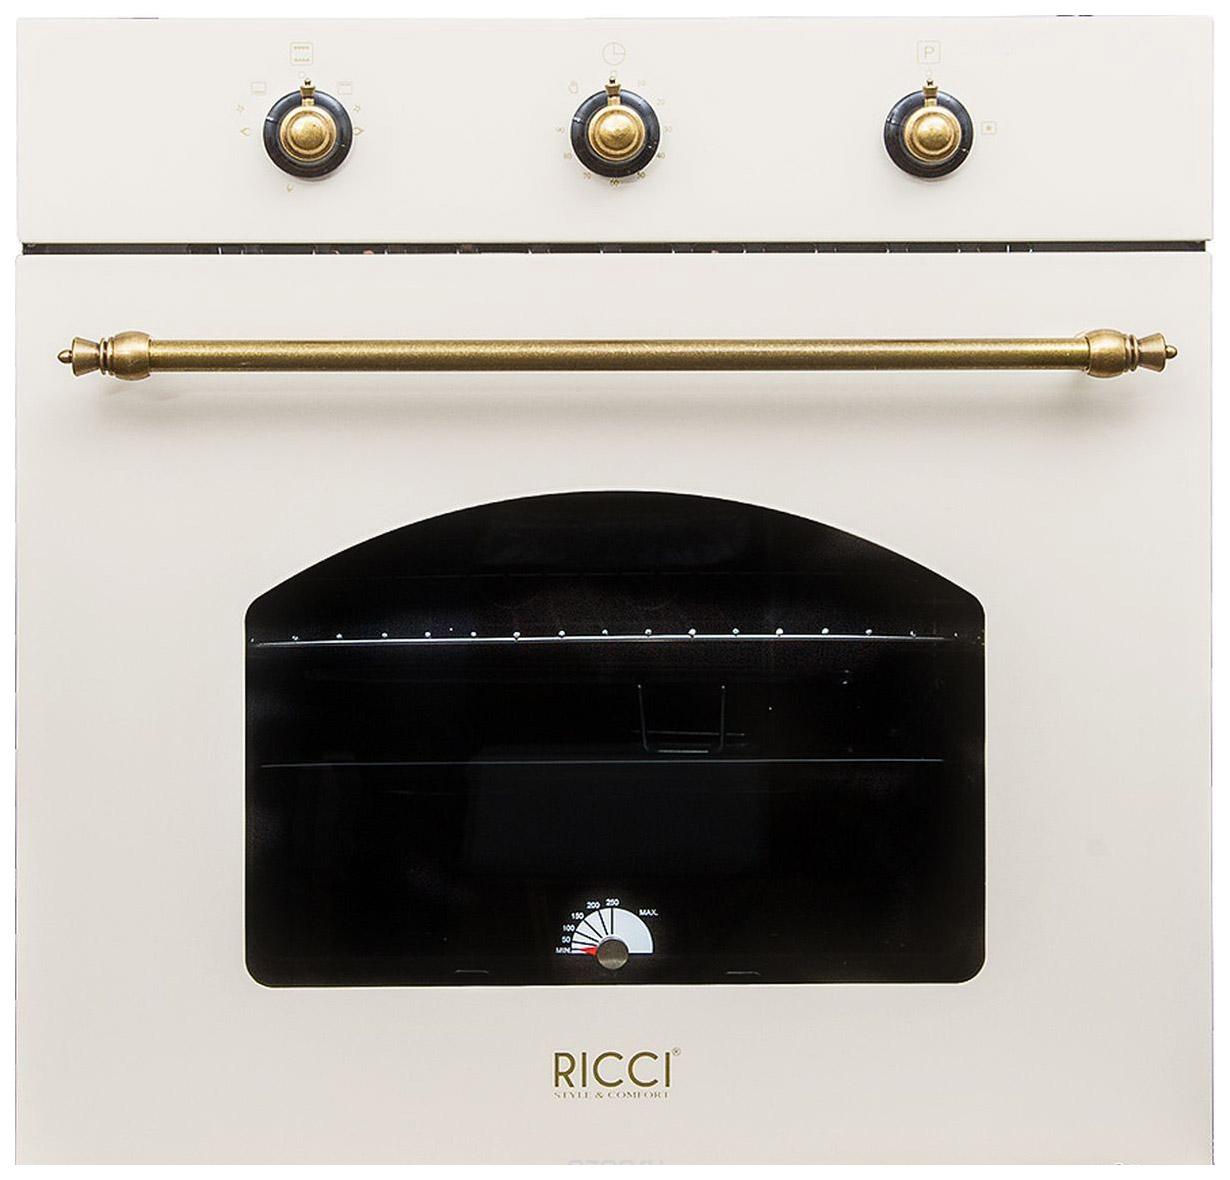 RICCI RGO-620BG